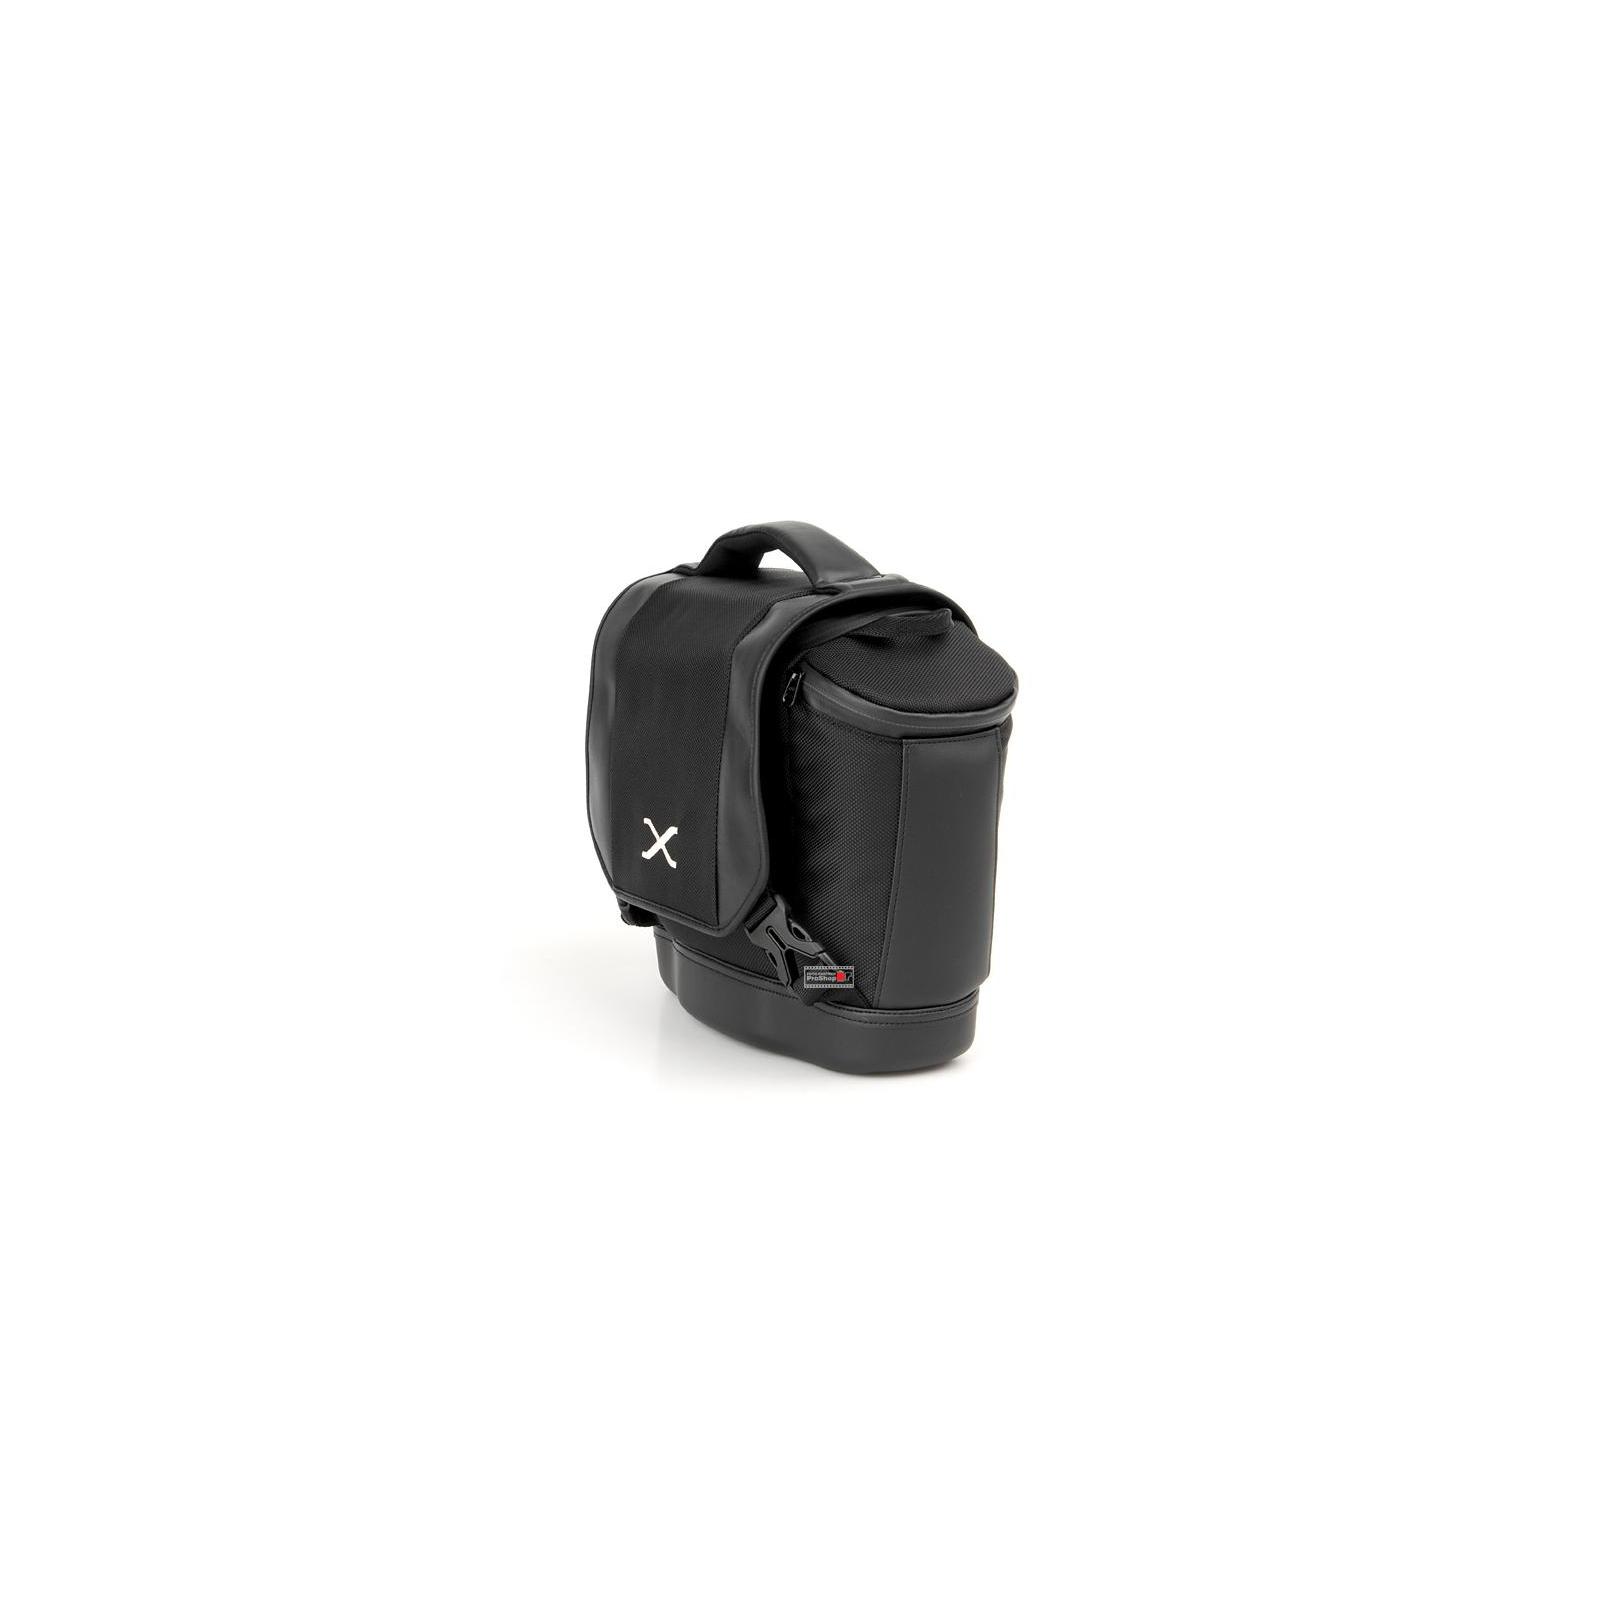 Фото-сумка Fujifilm SC-X black (04004455) изображение 2